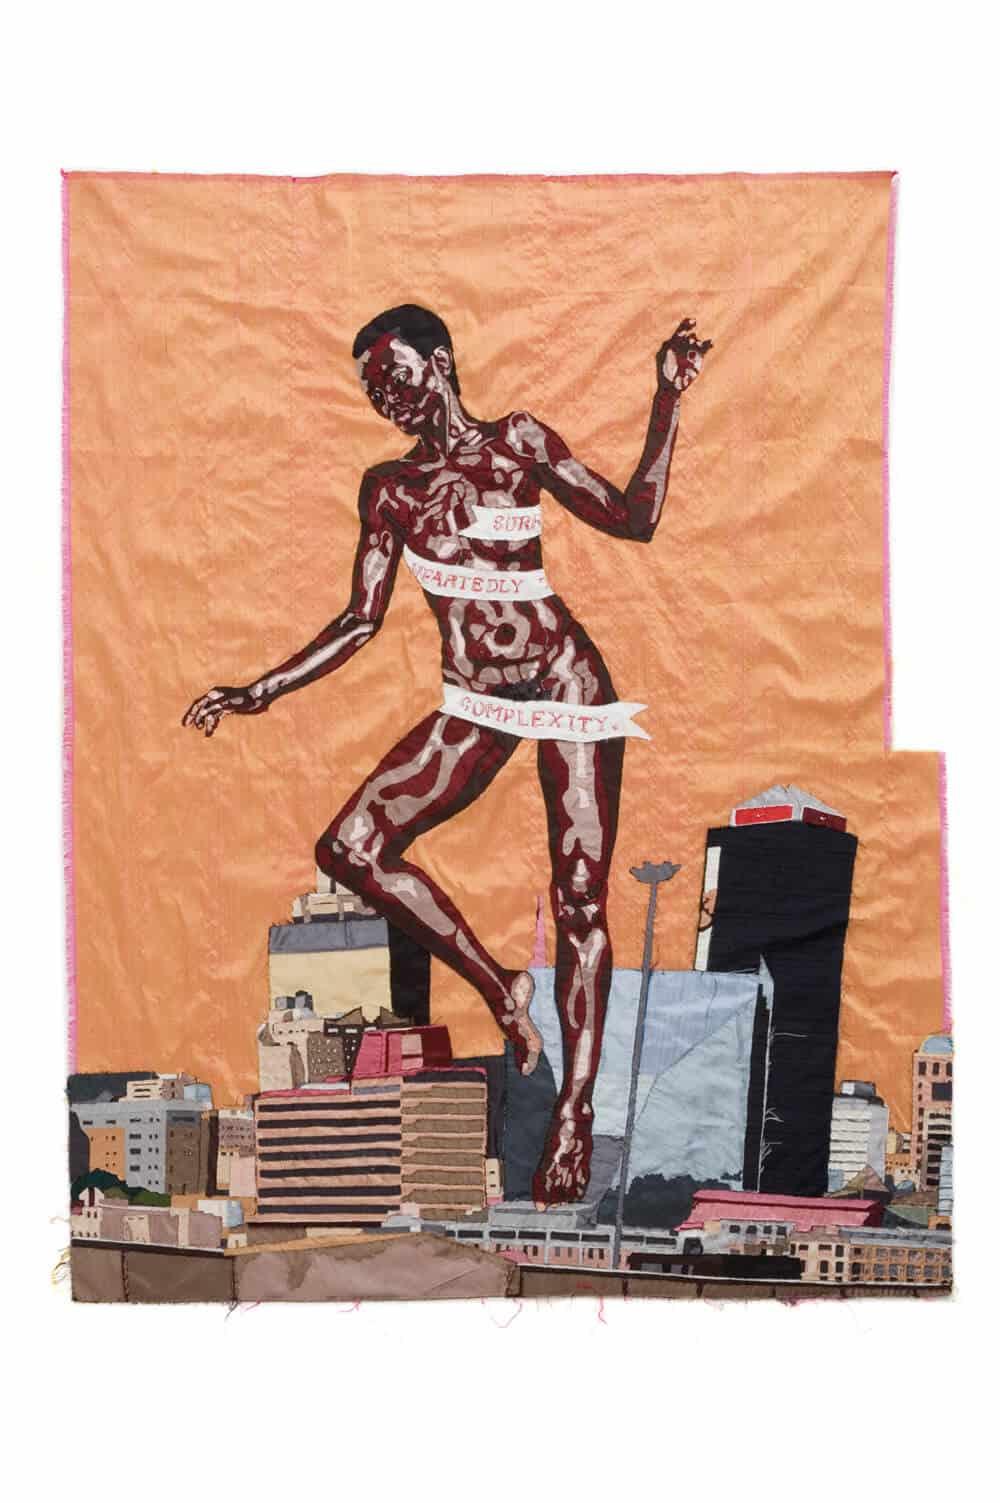 Billie Zangewa, The rebirth of the black venus, 2010. Silk tapestry, 127x103cm. Courtesy of the artist & blank projects.